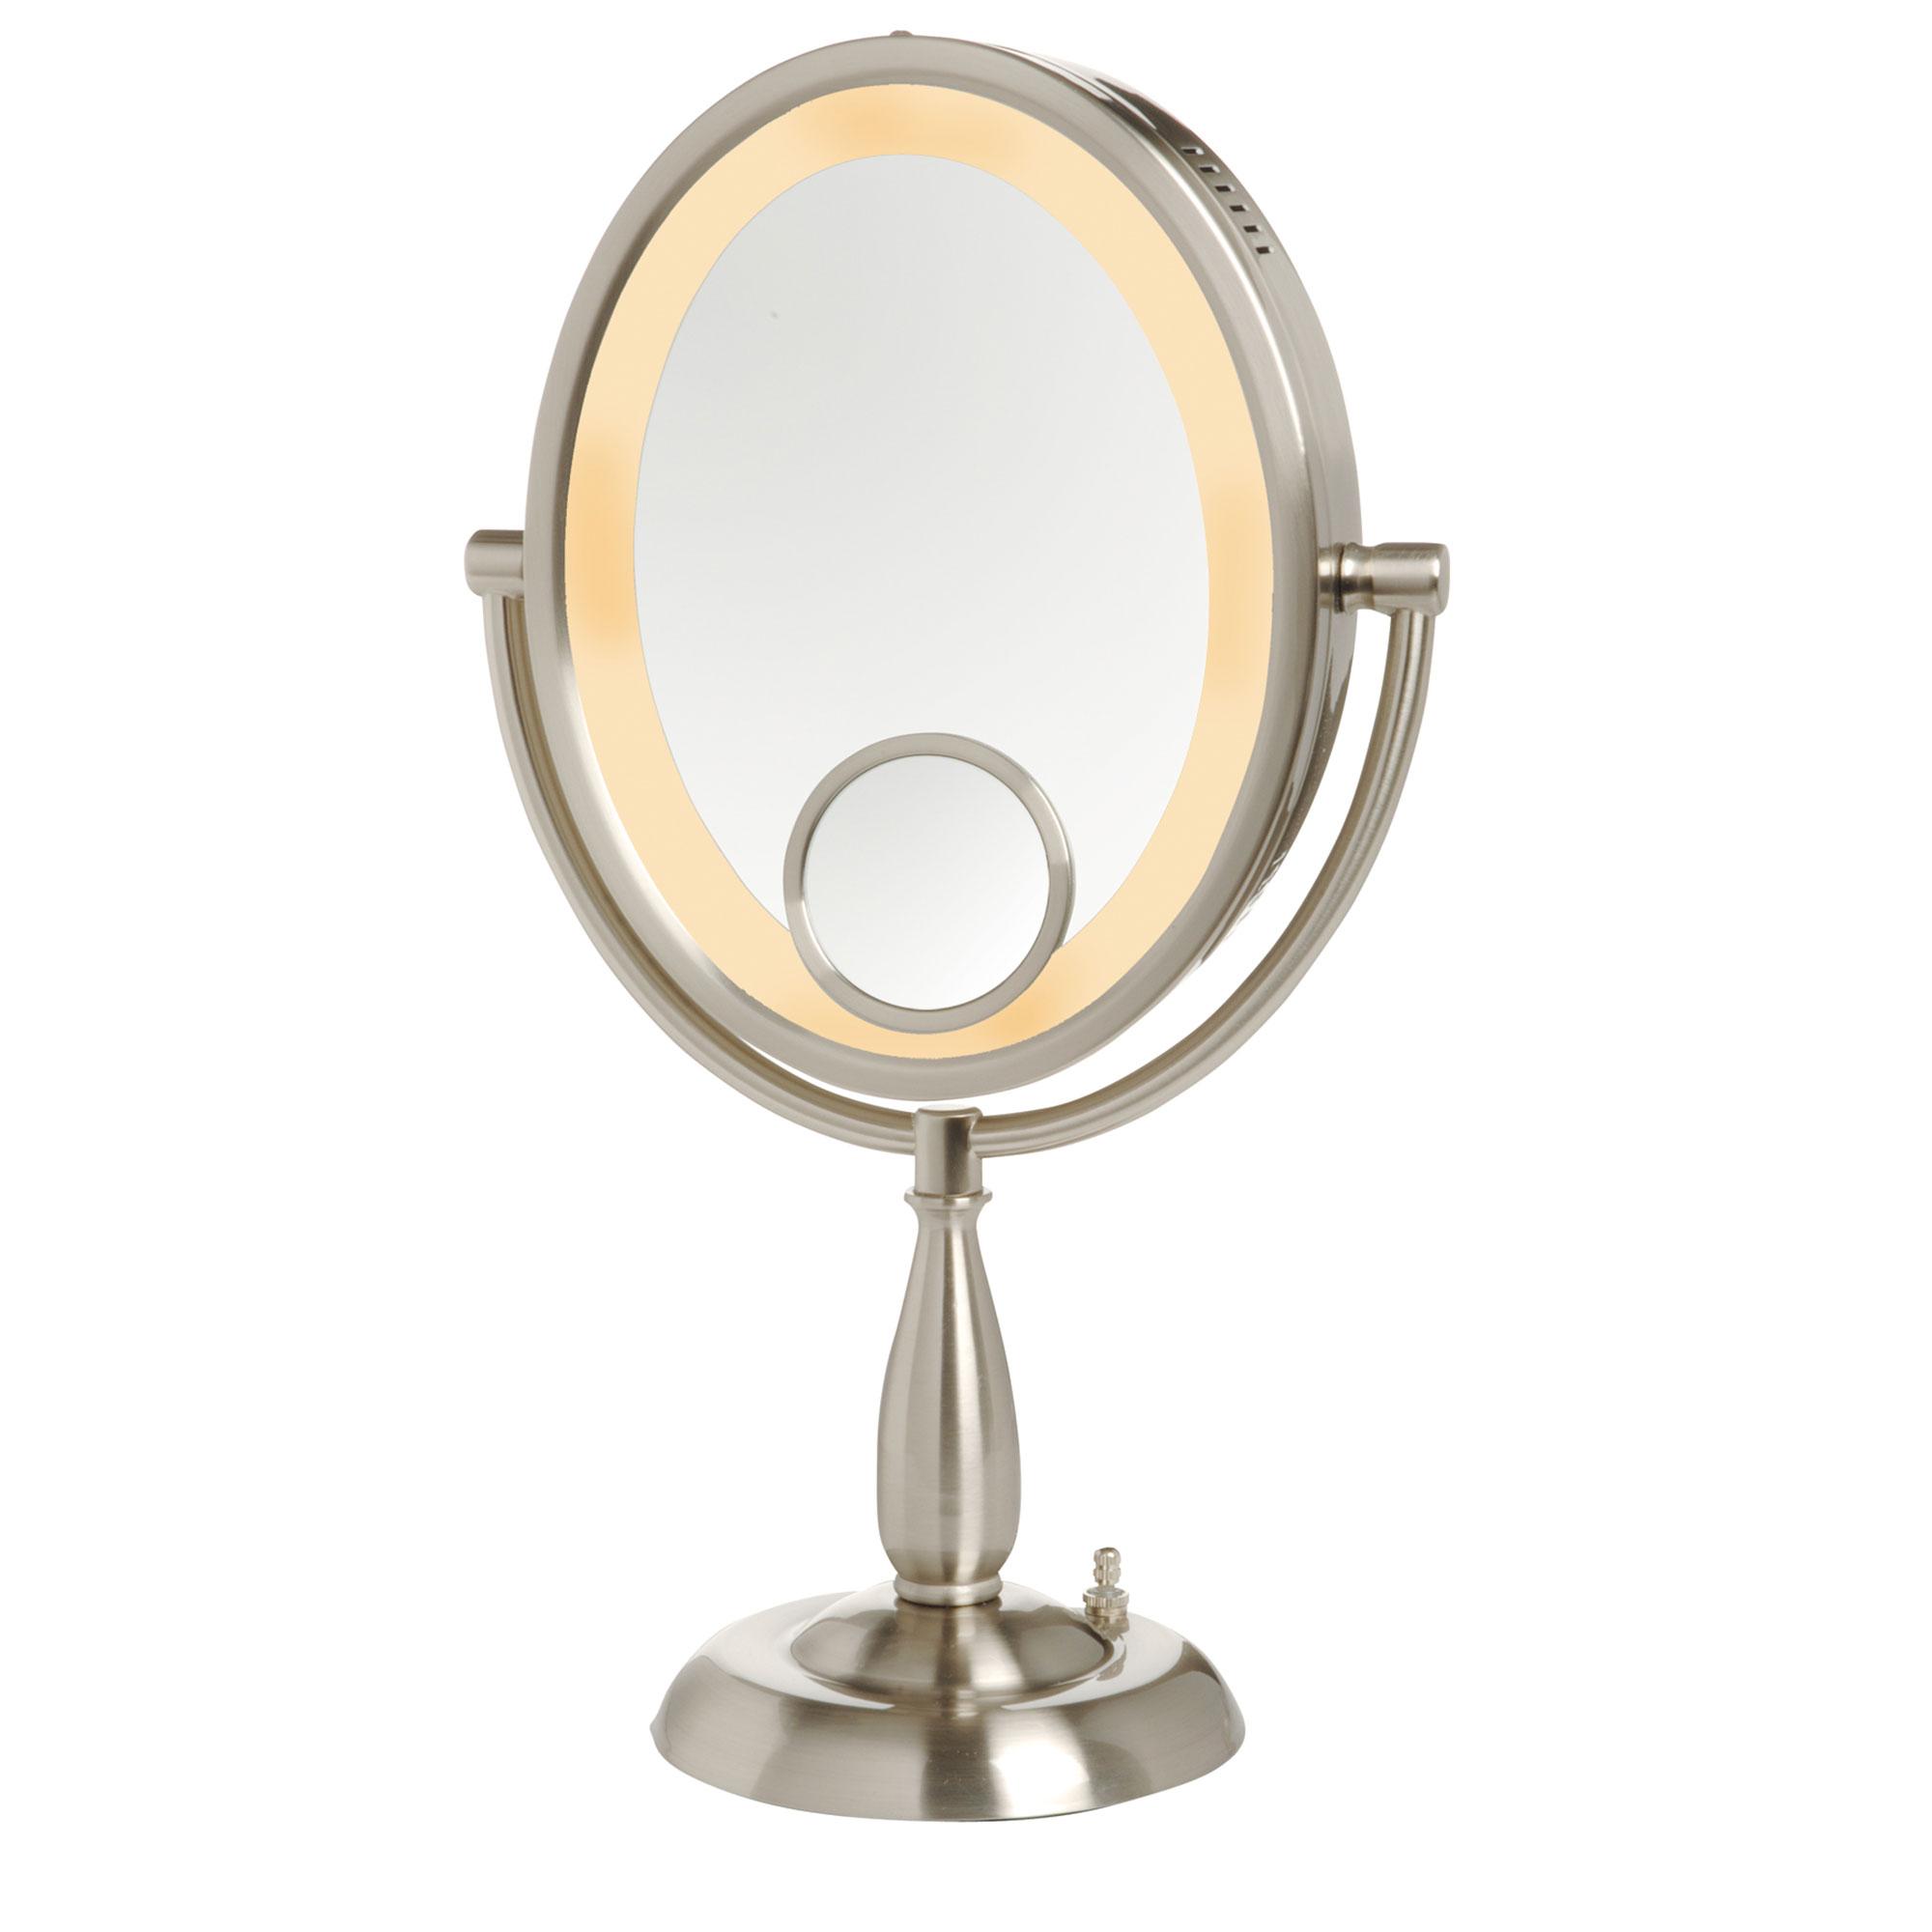 Jerdon Hl9510n Oval Lighted Tabletop Mirror 1x 10x